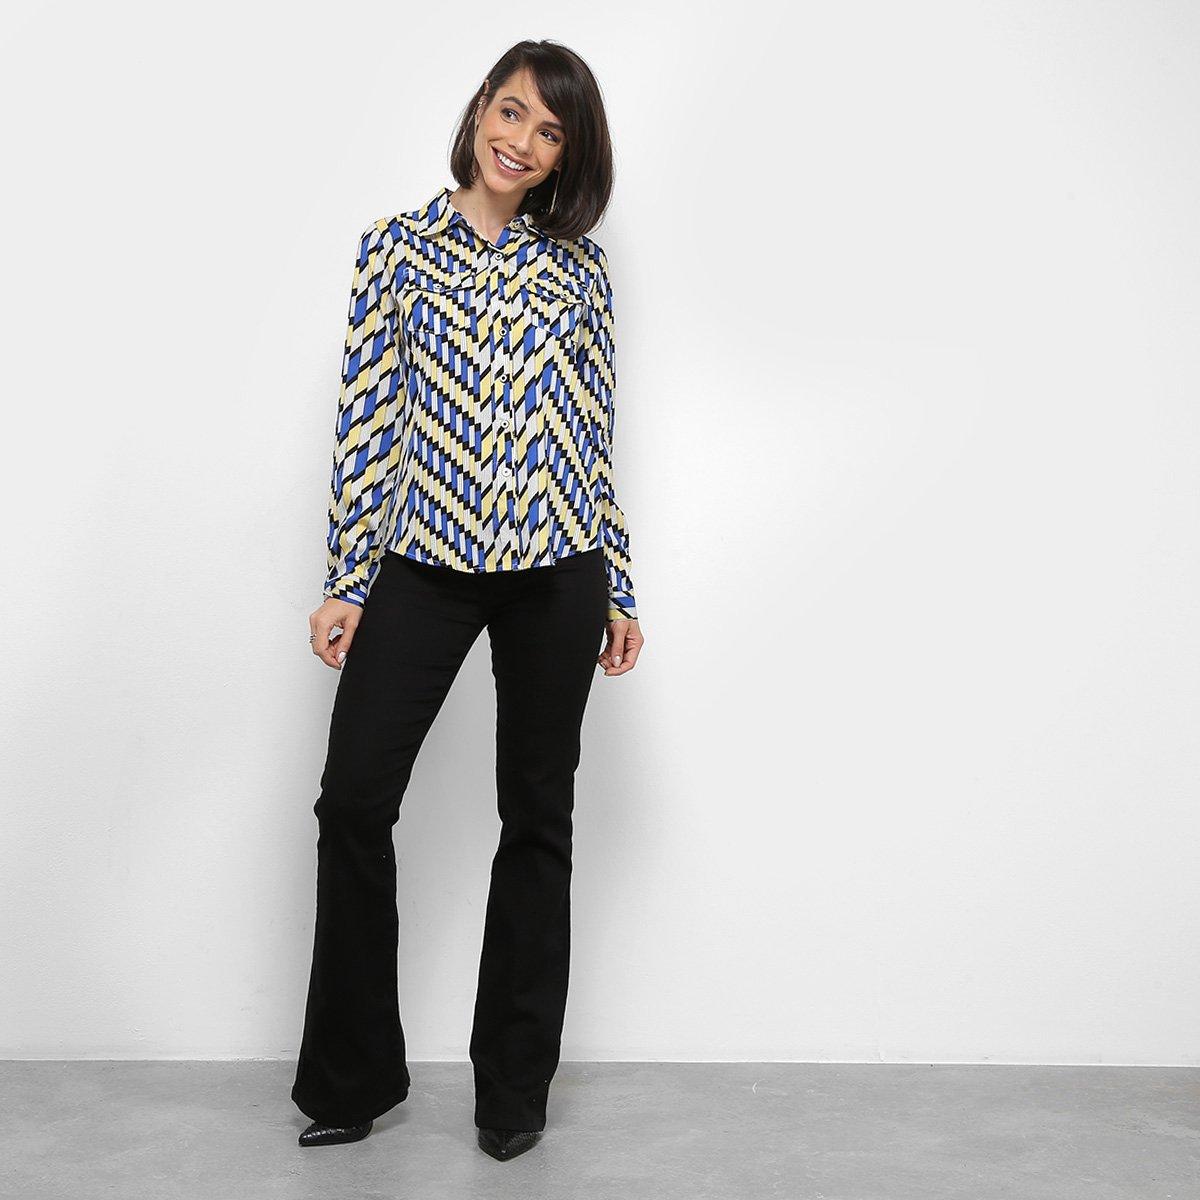 Camisa Extin Manga Longa Estampa Geométrica Feminina - Azul